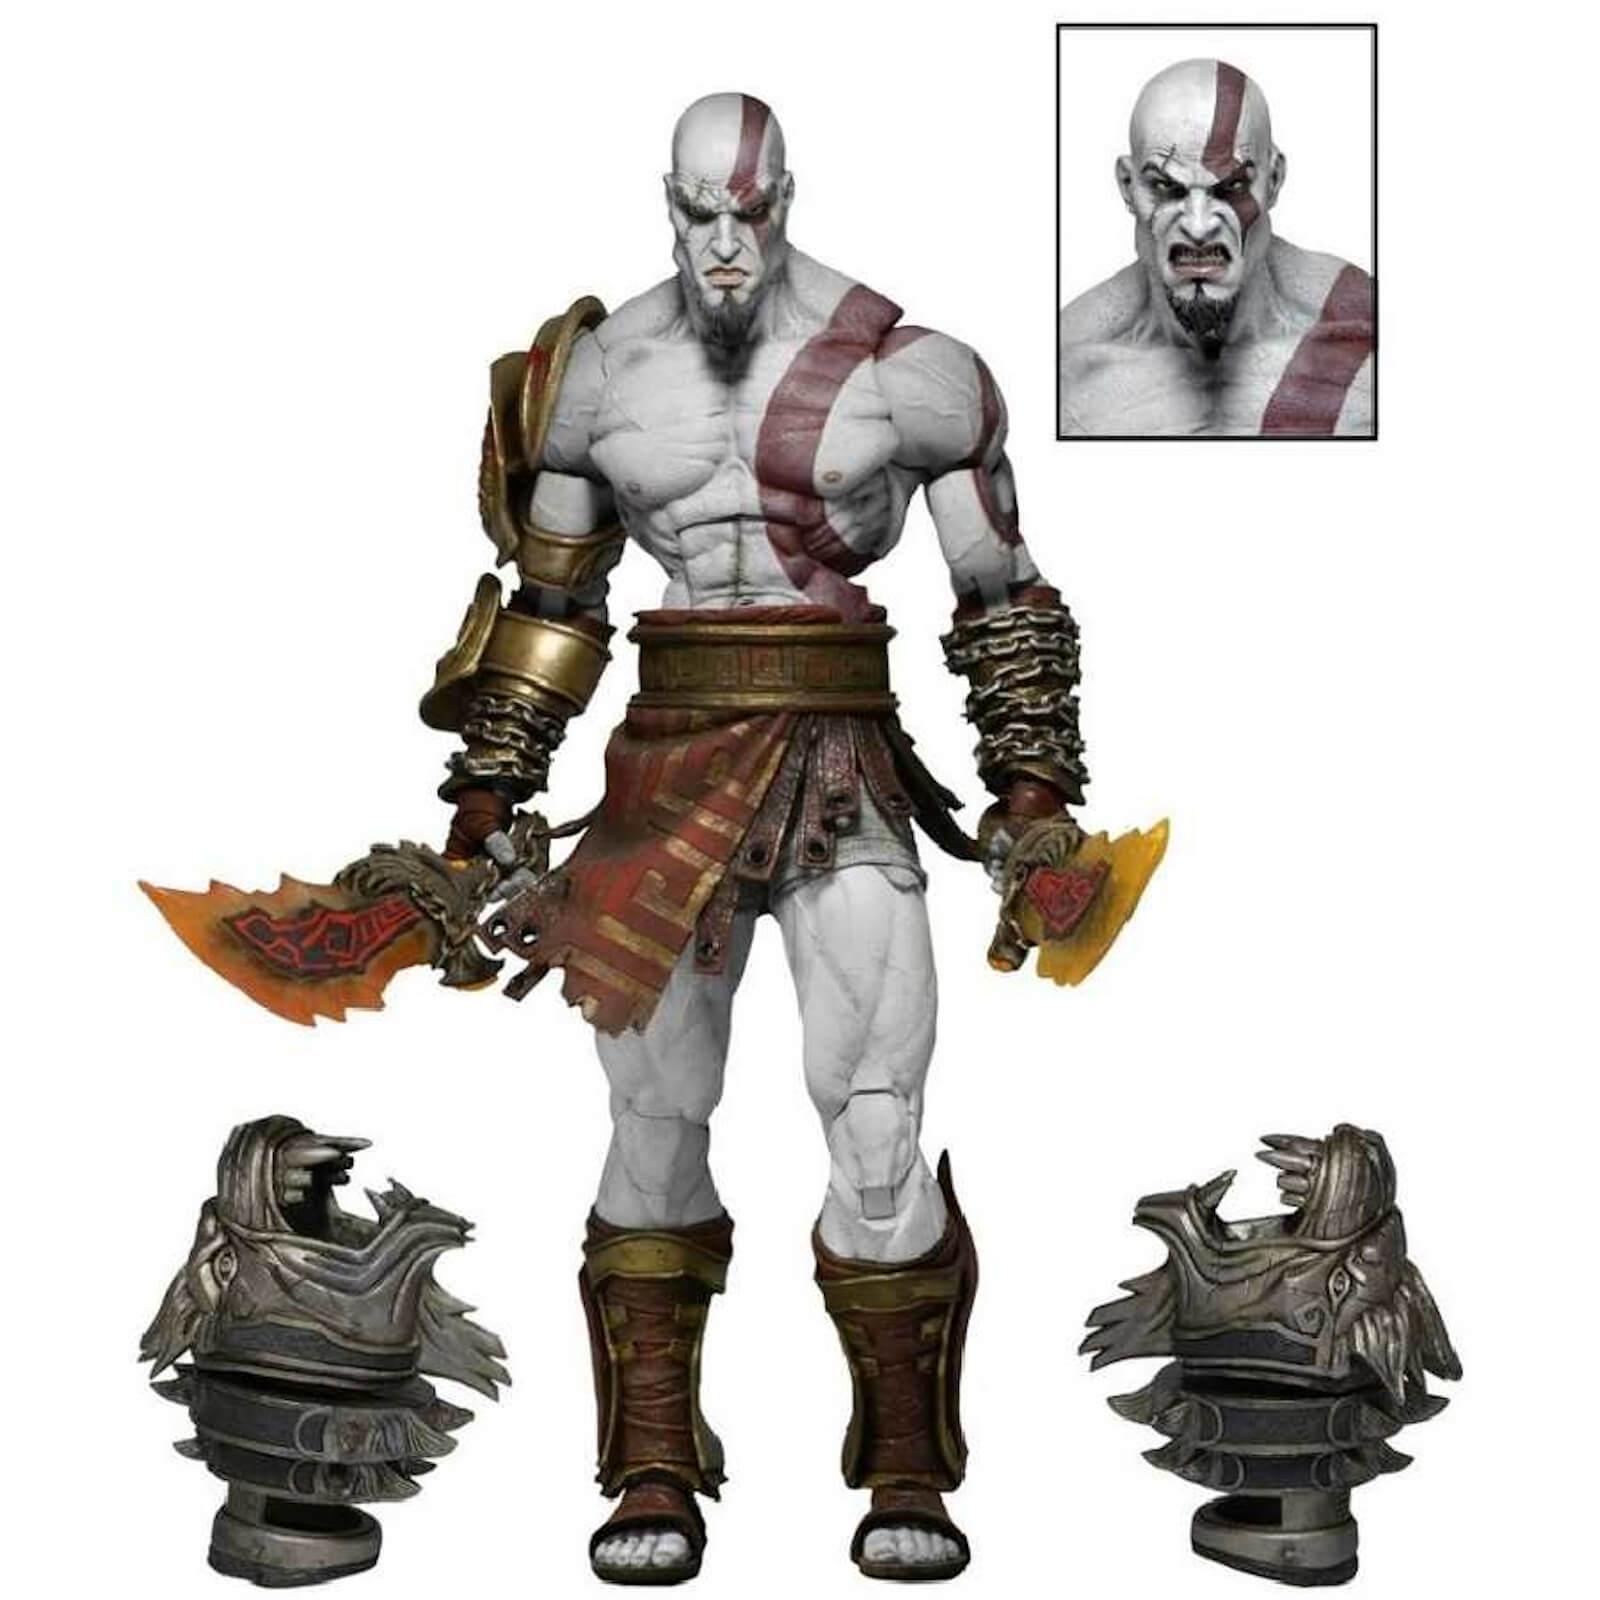 God of War 3 - Ultimate Kratos Action Figur (17cm) für 27,82€ inkl. Versand (Zavvi)